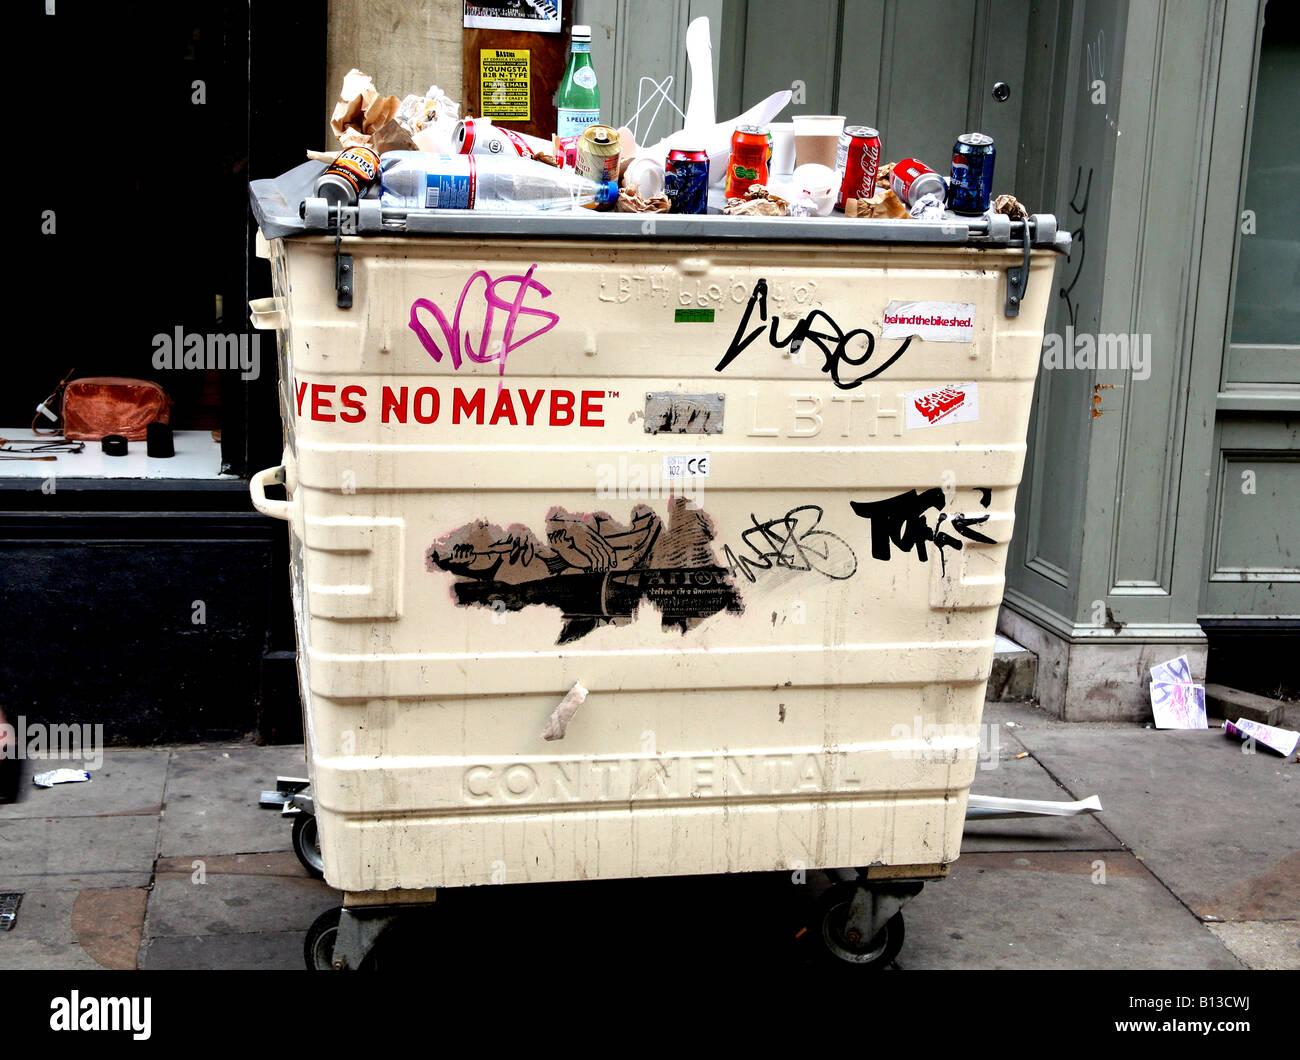 Rubbish placed on top of bin in London street Stock Photo